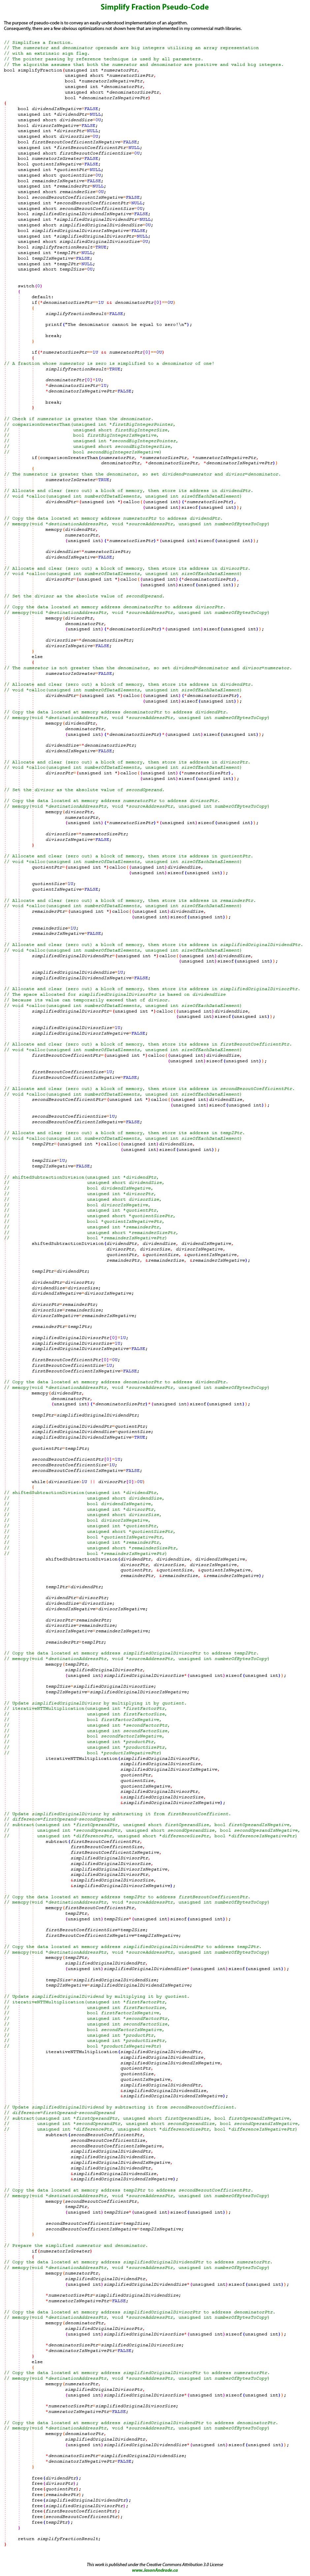 Simplify Fraction Pseudo-Code